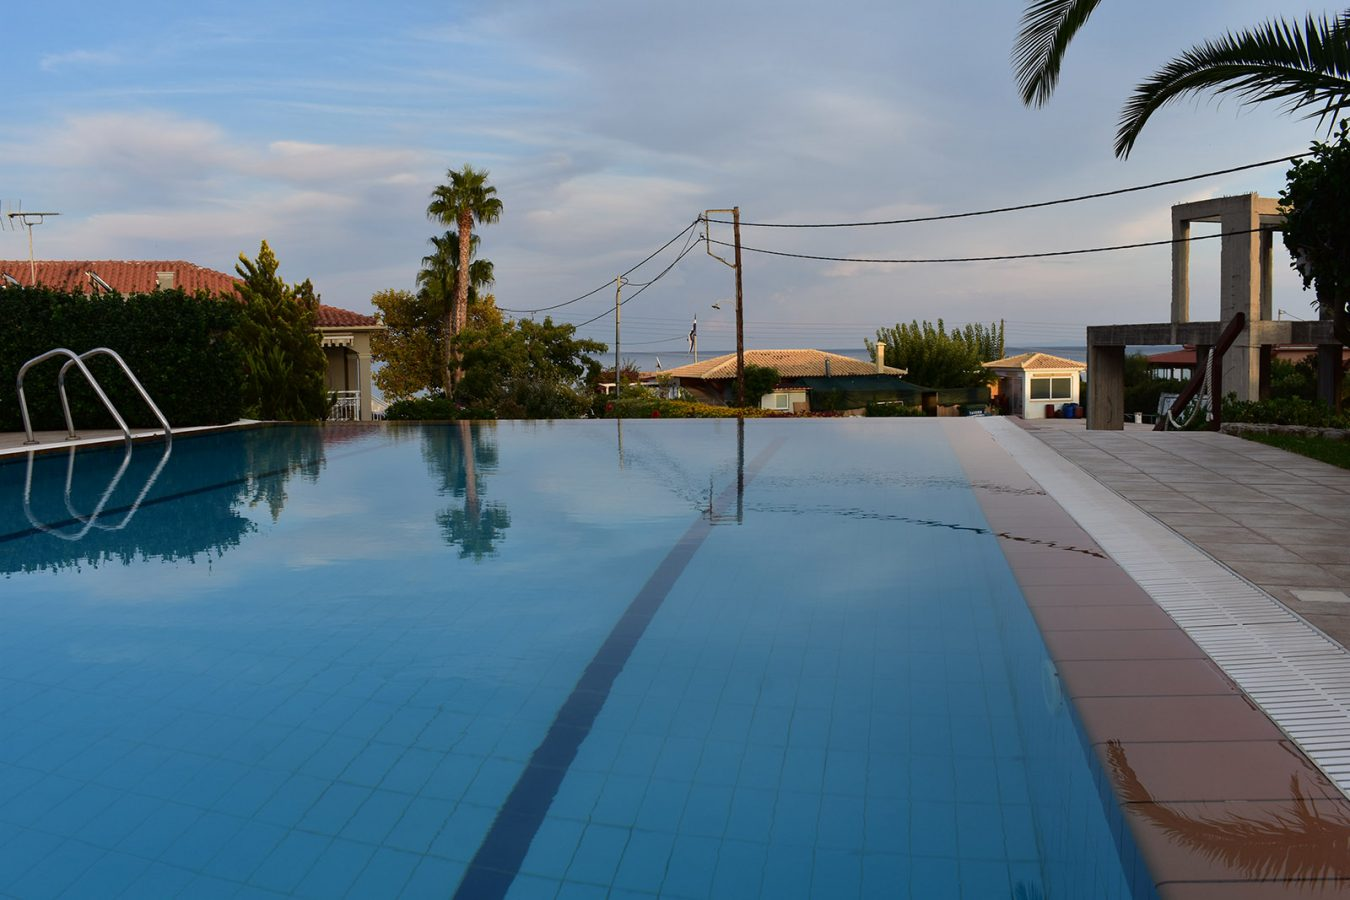 Exterior pool in Skala Kefalonia - Melidron Hotel Kefalonia